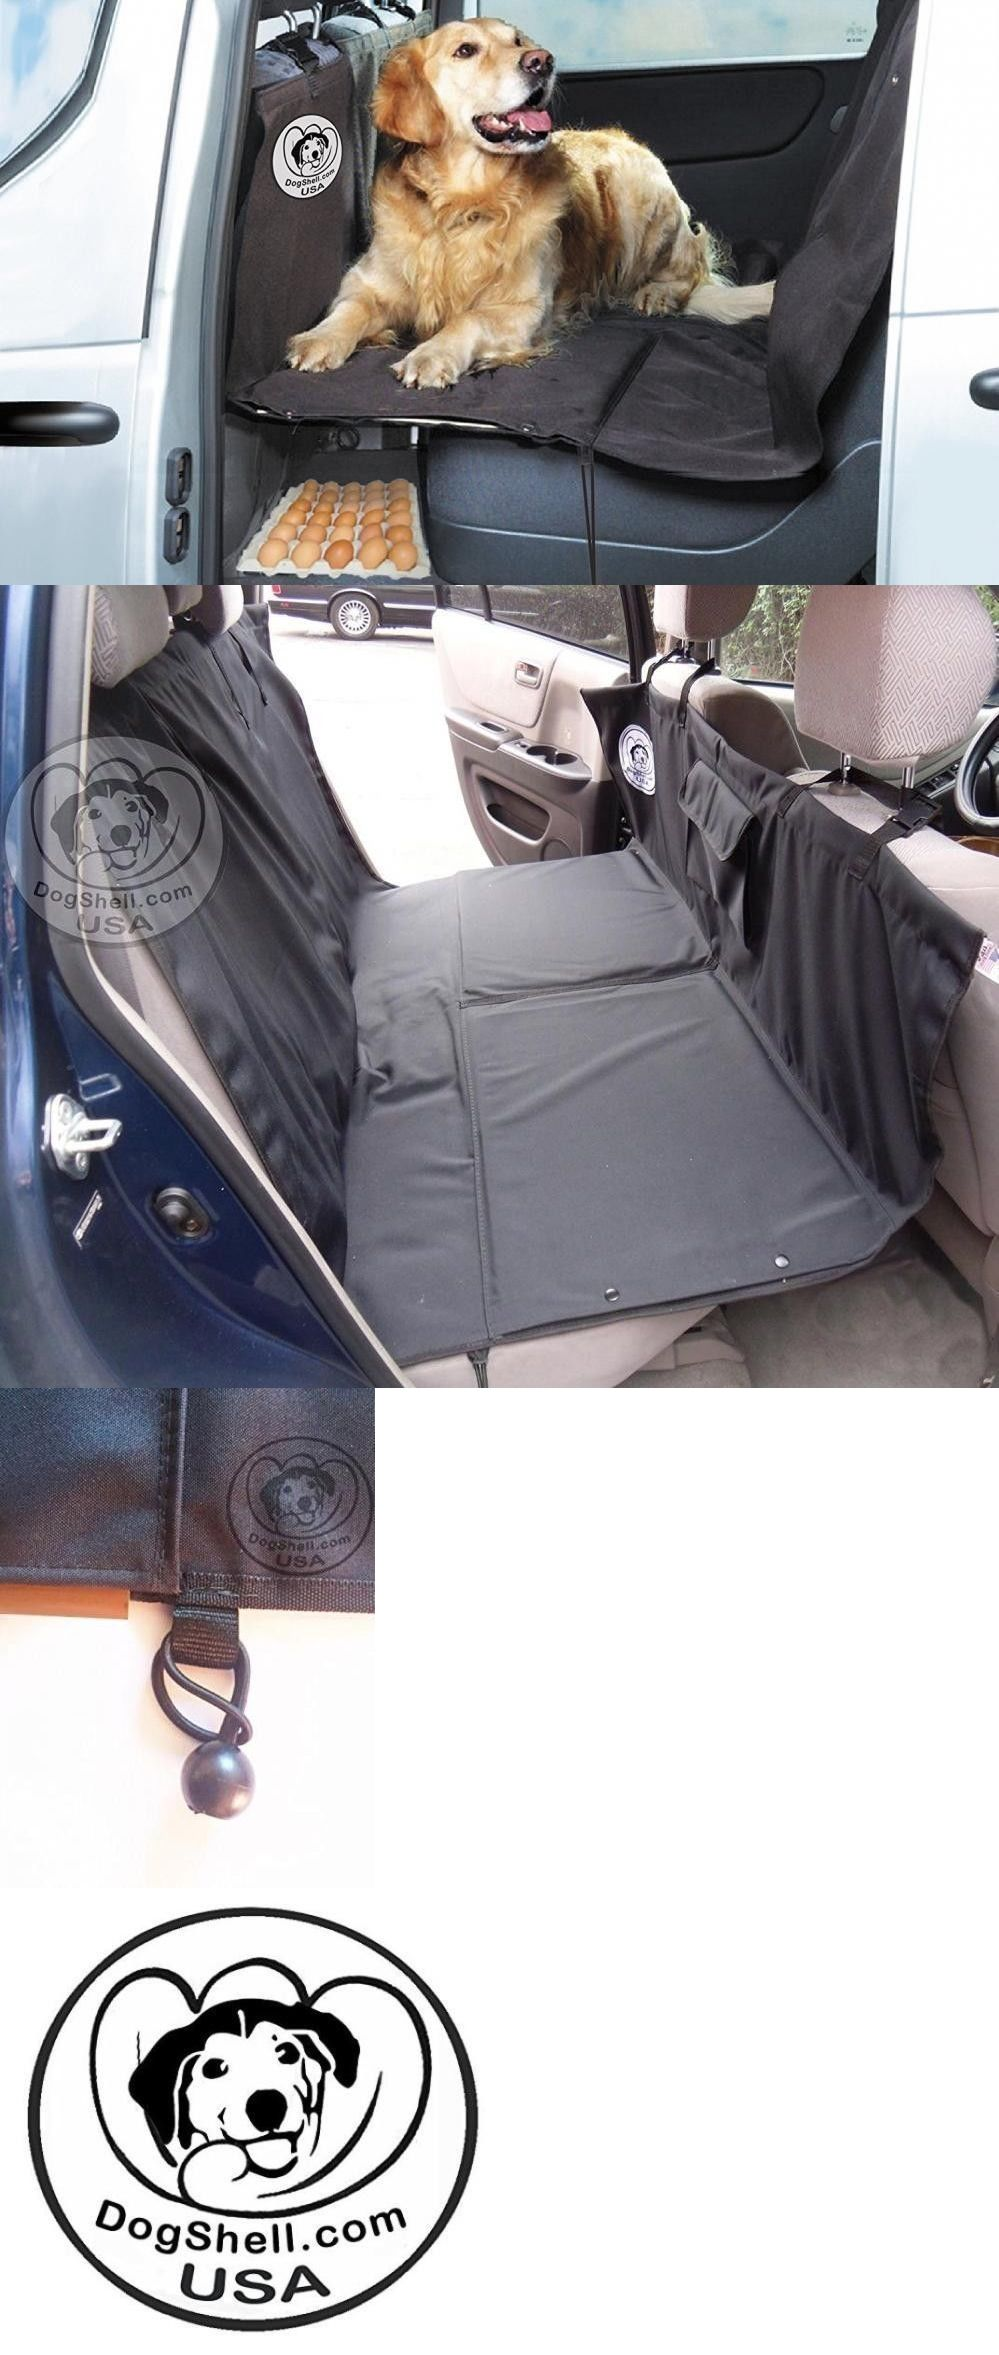 Dogshell car suv dog pet heavyduty backseat cover extended